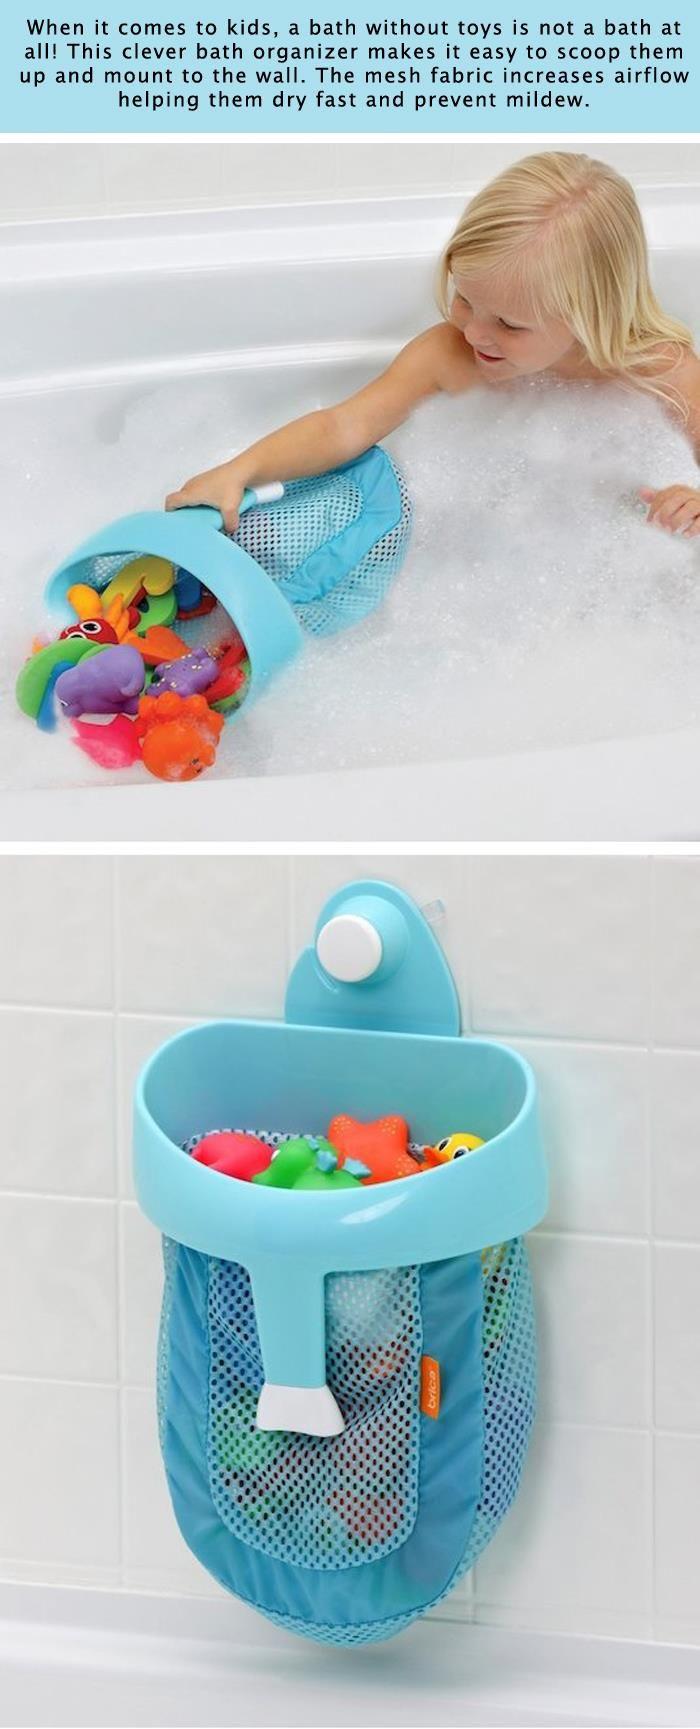 25+ great ideas about Bath toys on Pinterest | Bath toy ...